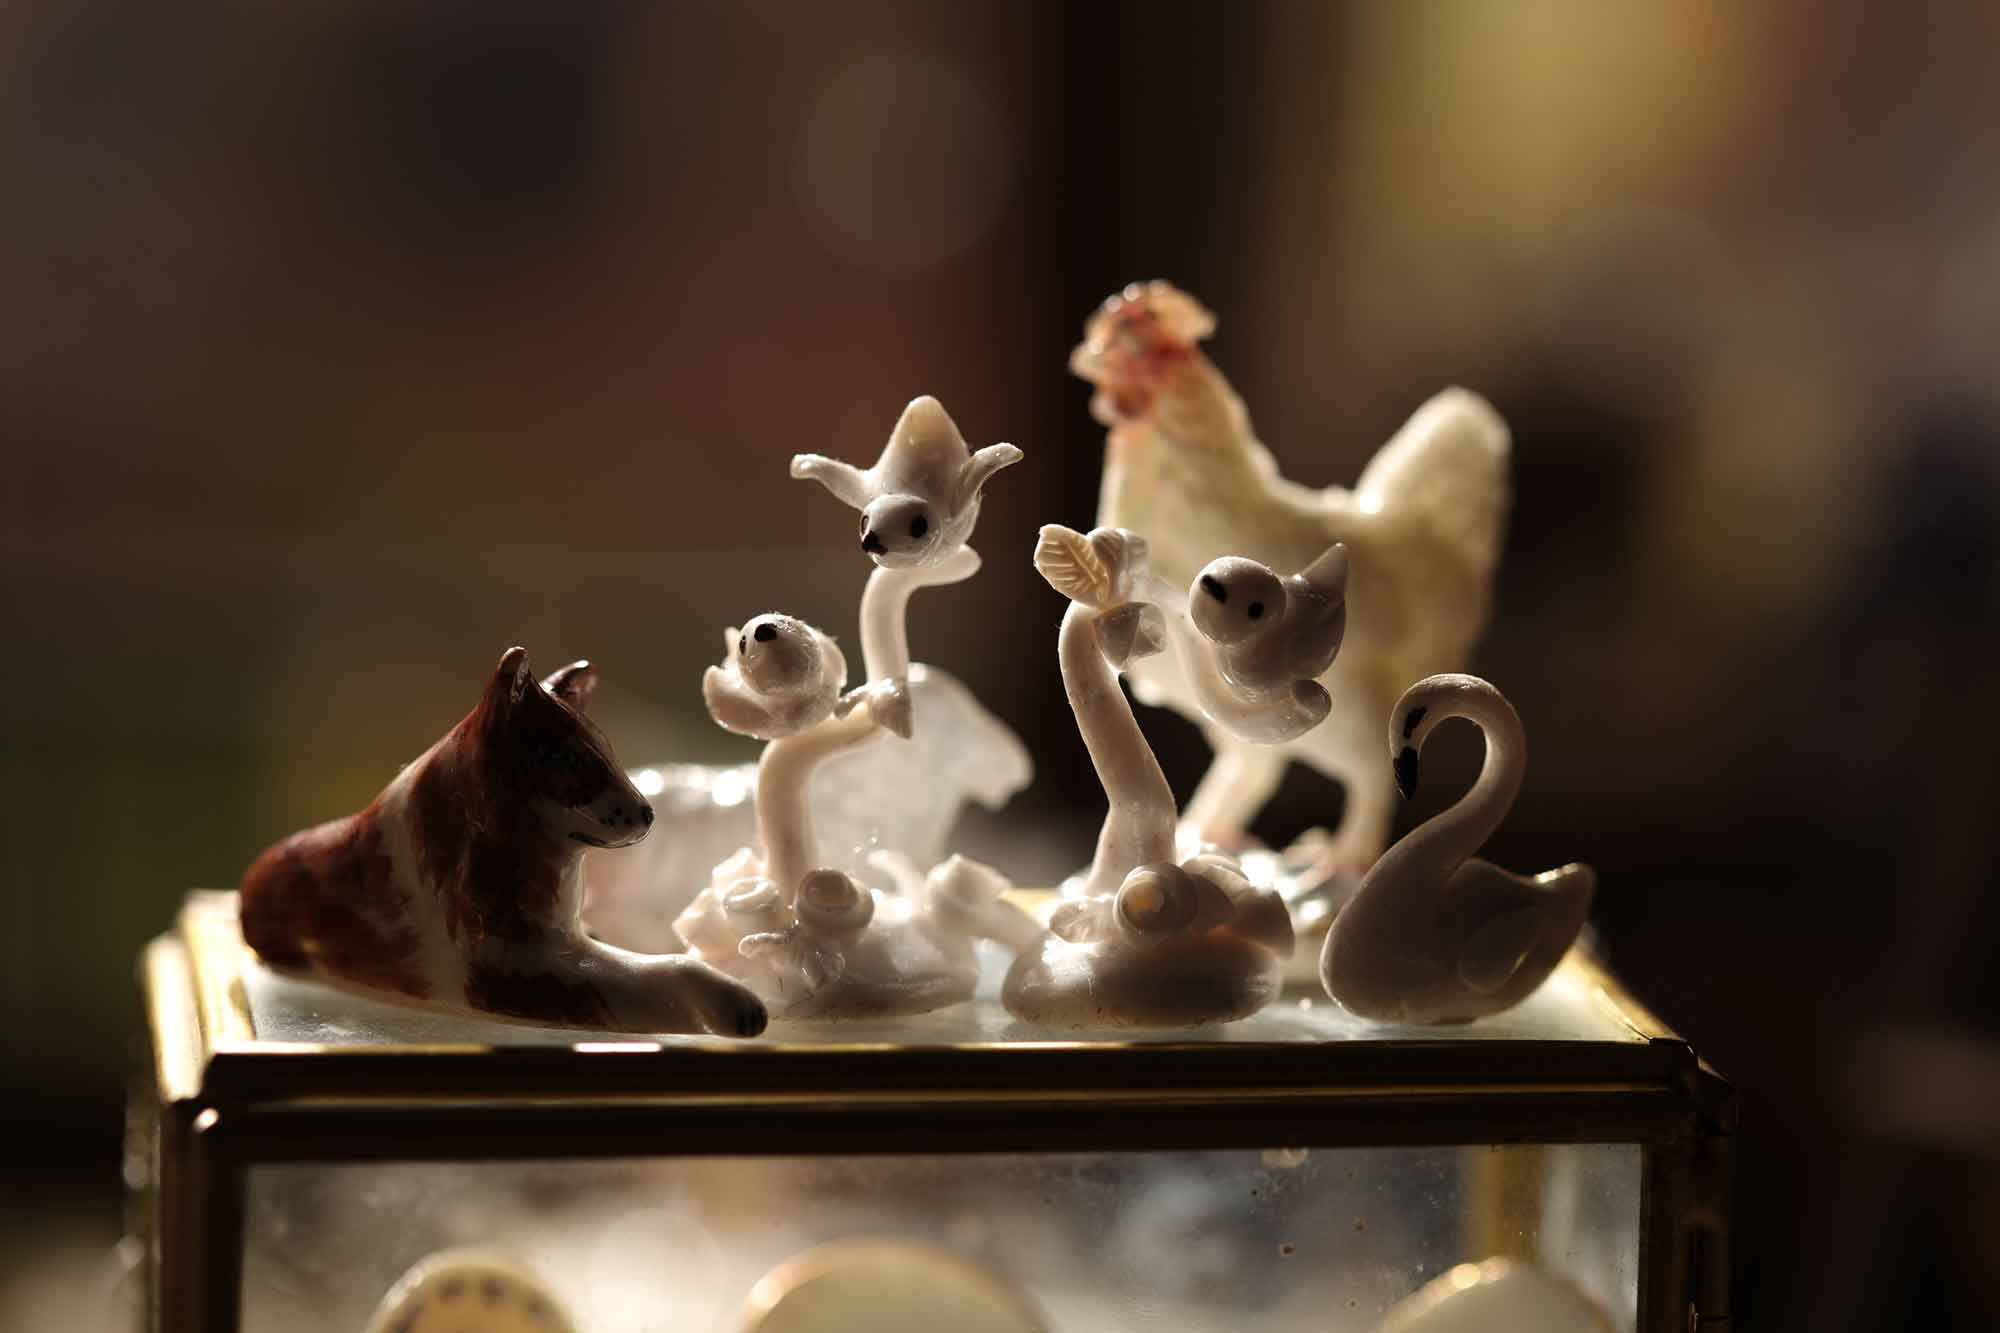 The Vast Landscape – porcelain stories